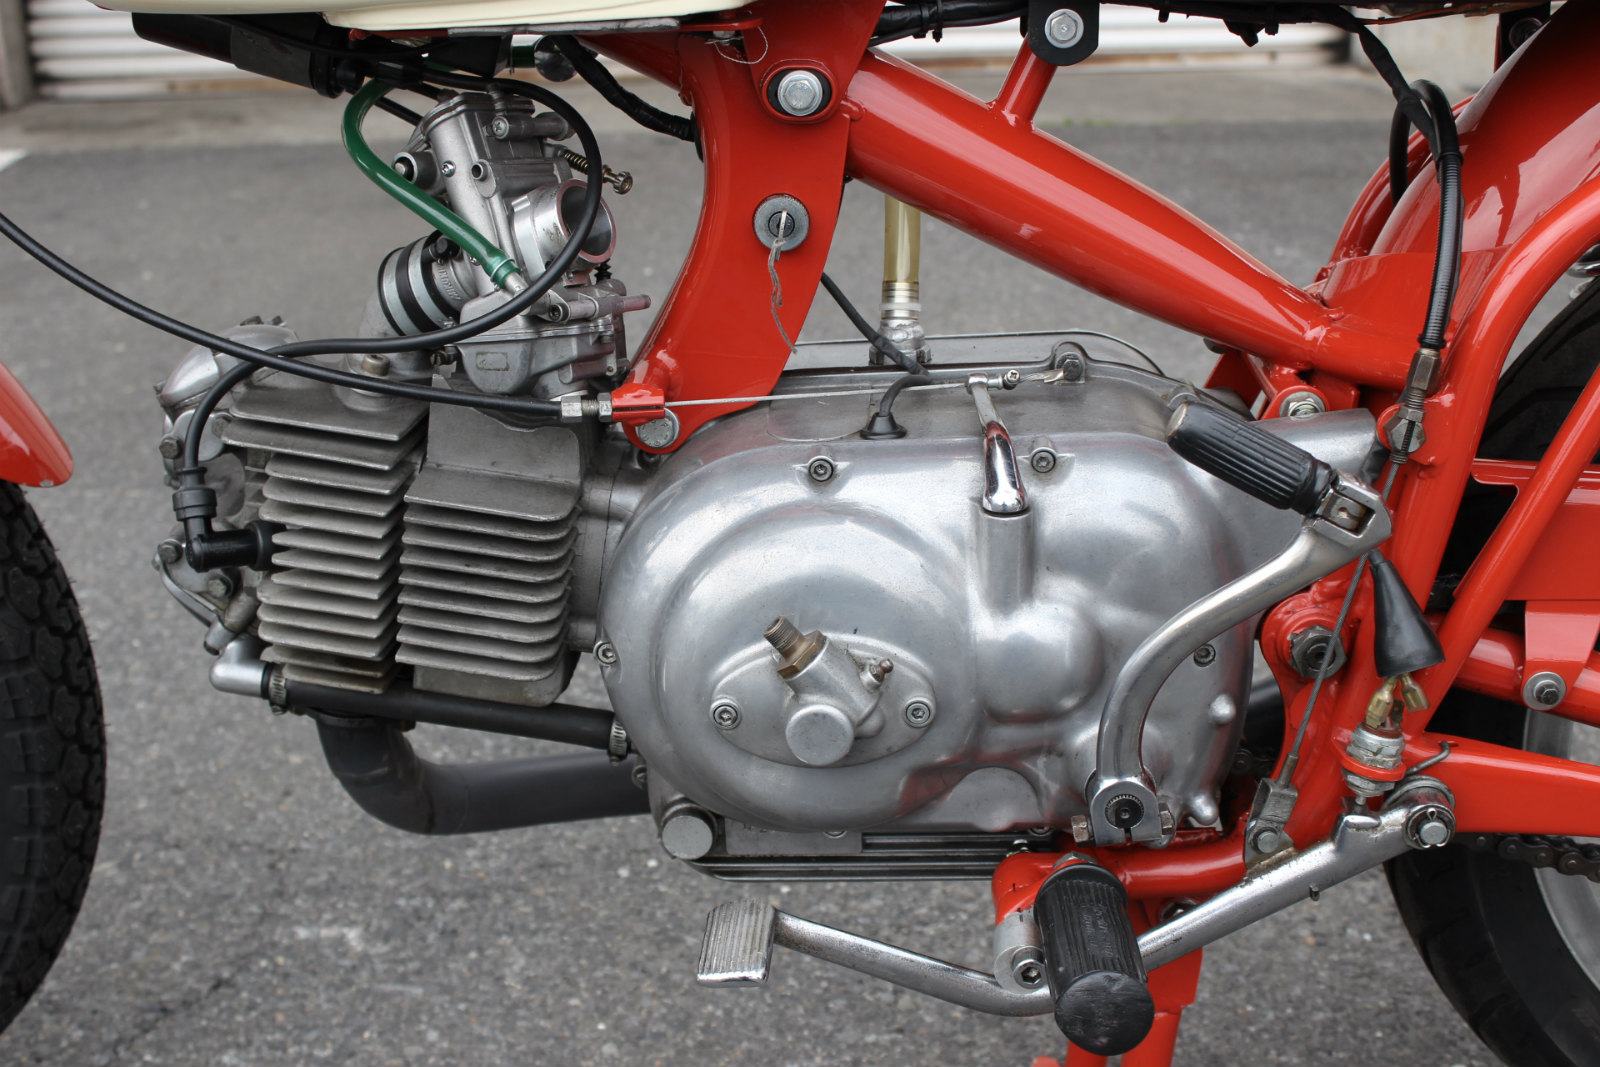 Harley Davidson Sprint_a0208987_14124996.jpg